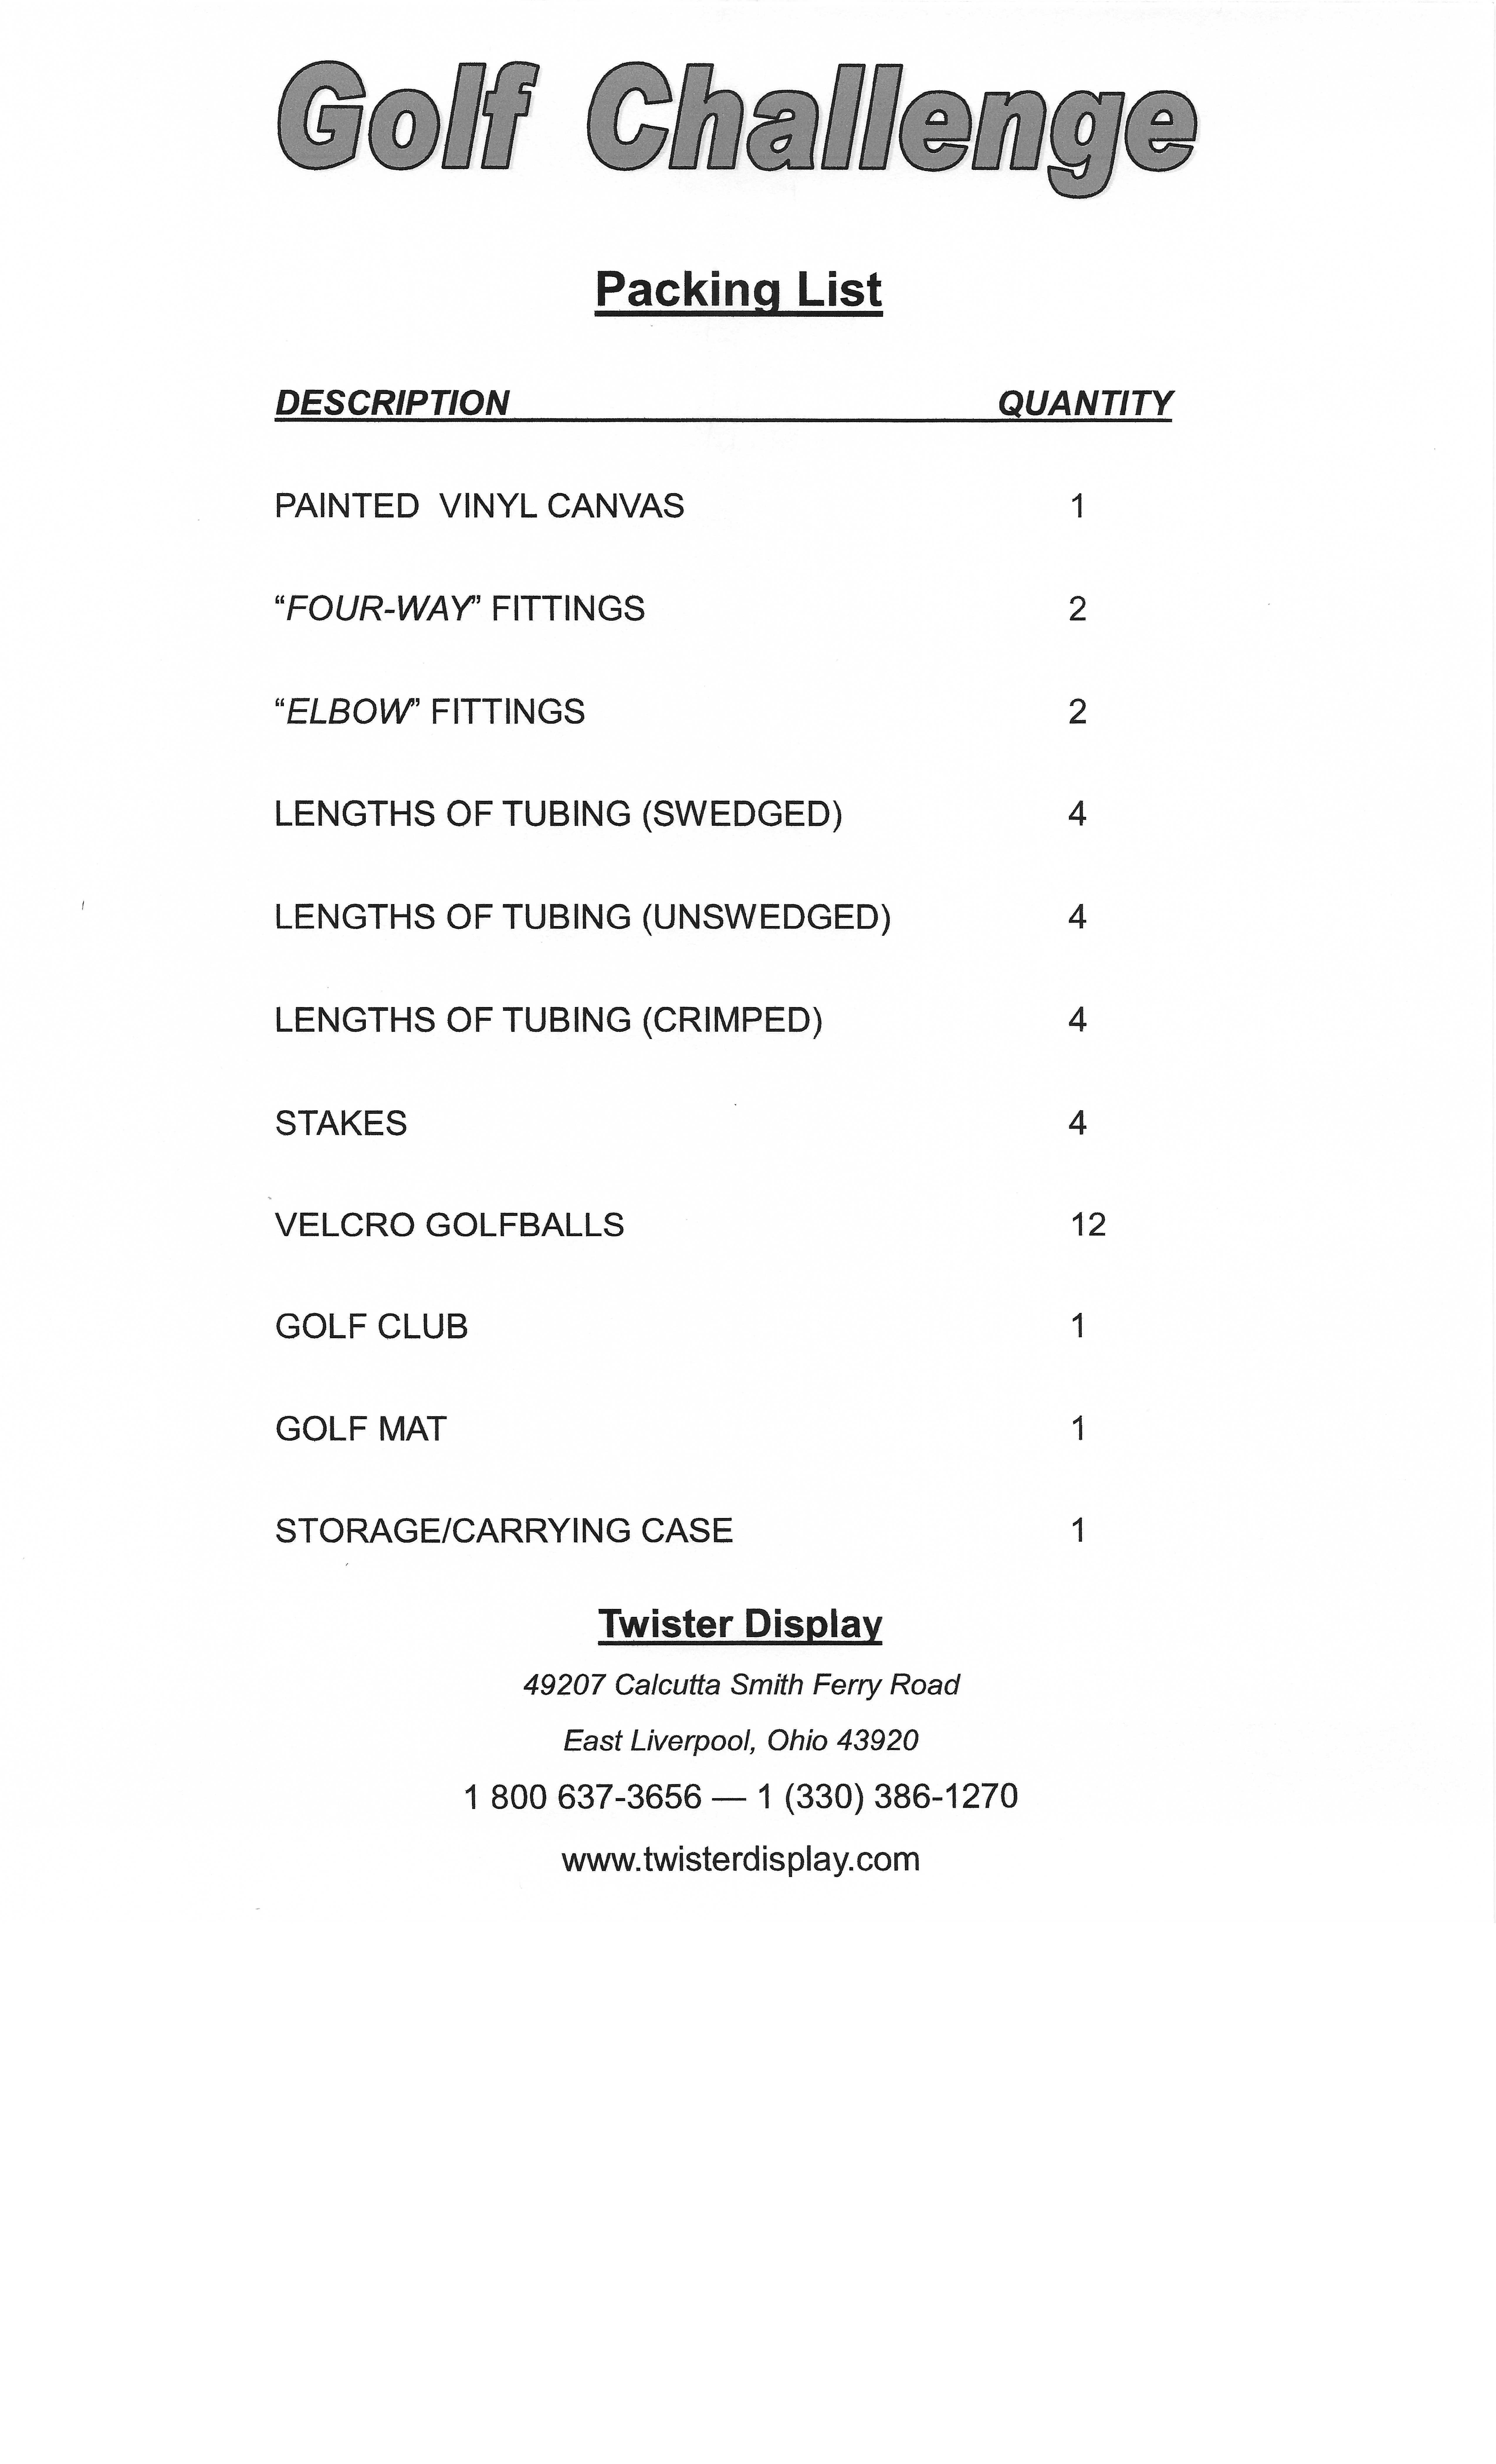 golf-chipping-challenge-instructions0001.jpg